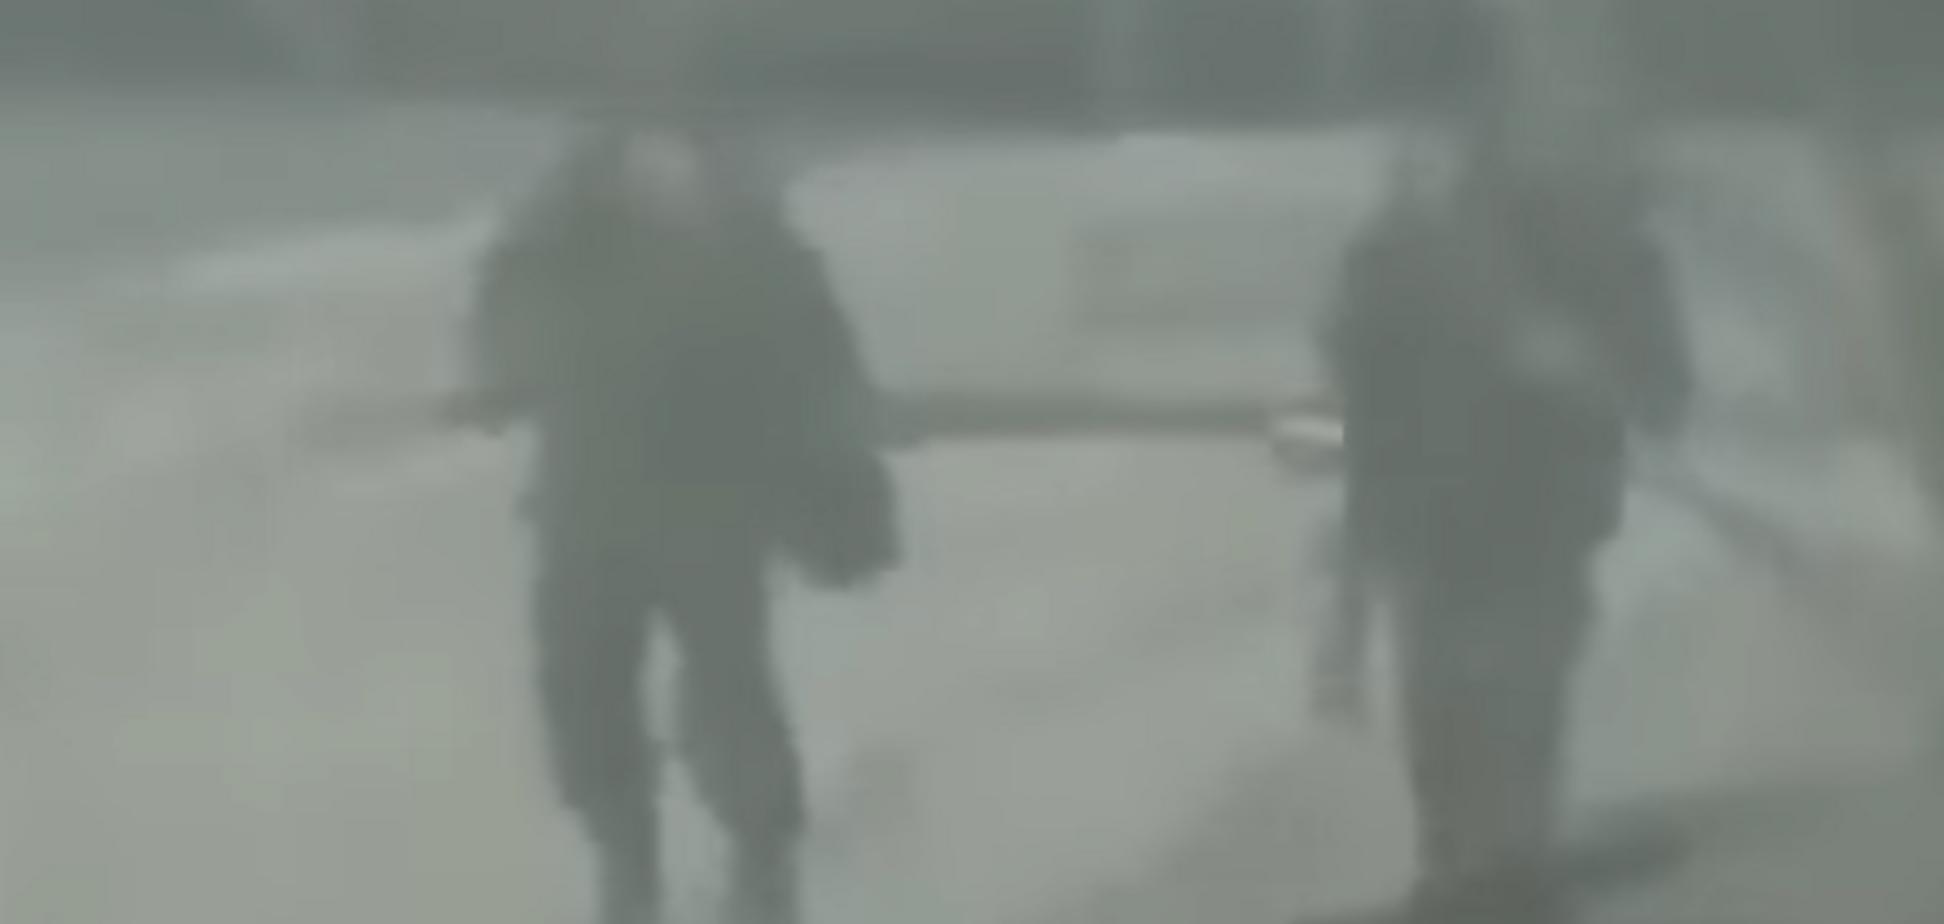 В ВСУ показали ликвидацию пулеметчика-террориста на Донбассе